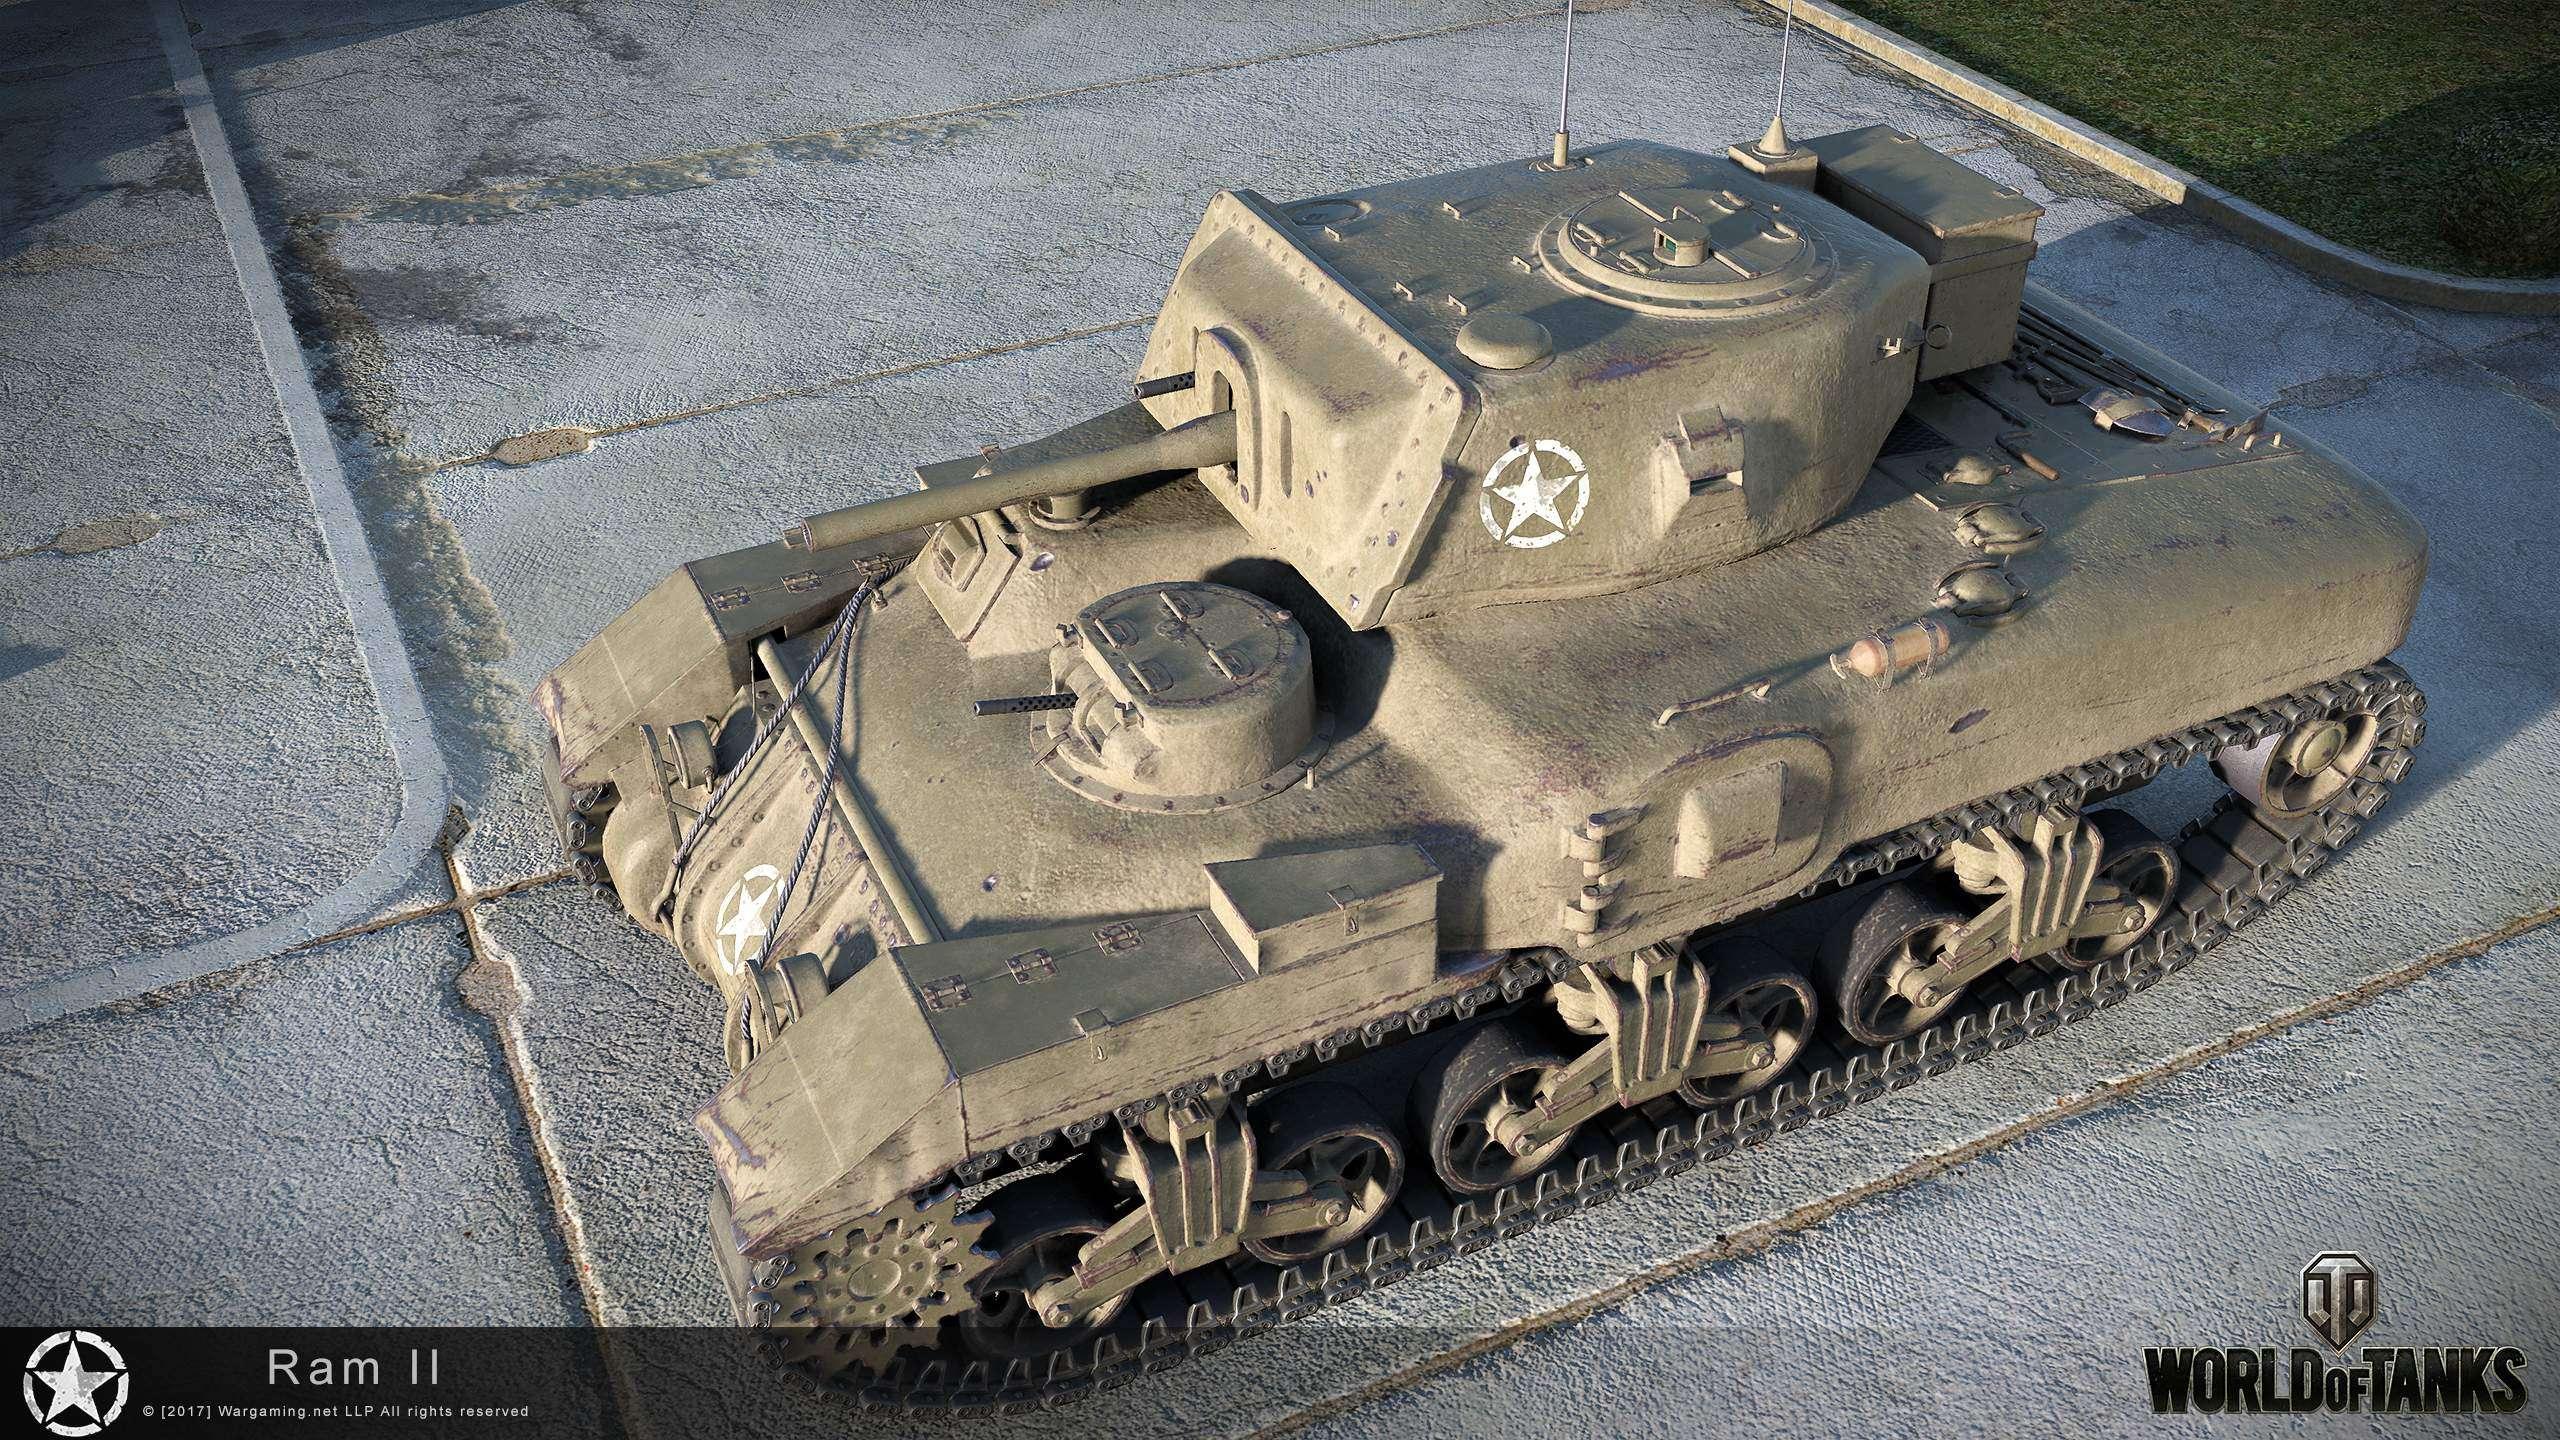 HD 9.18 Ram II, Pz.Kpfw.IV Ausf A, Pz.Kpfw. I, Объект430 II